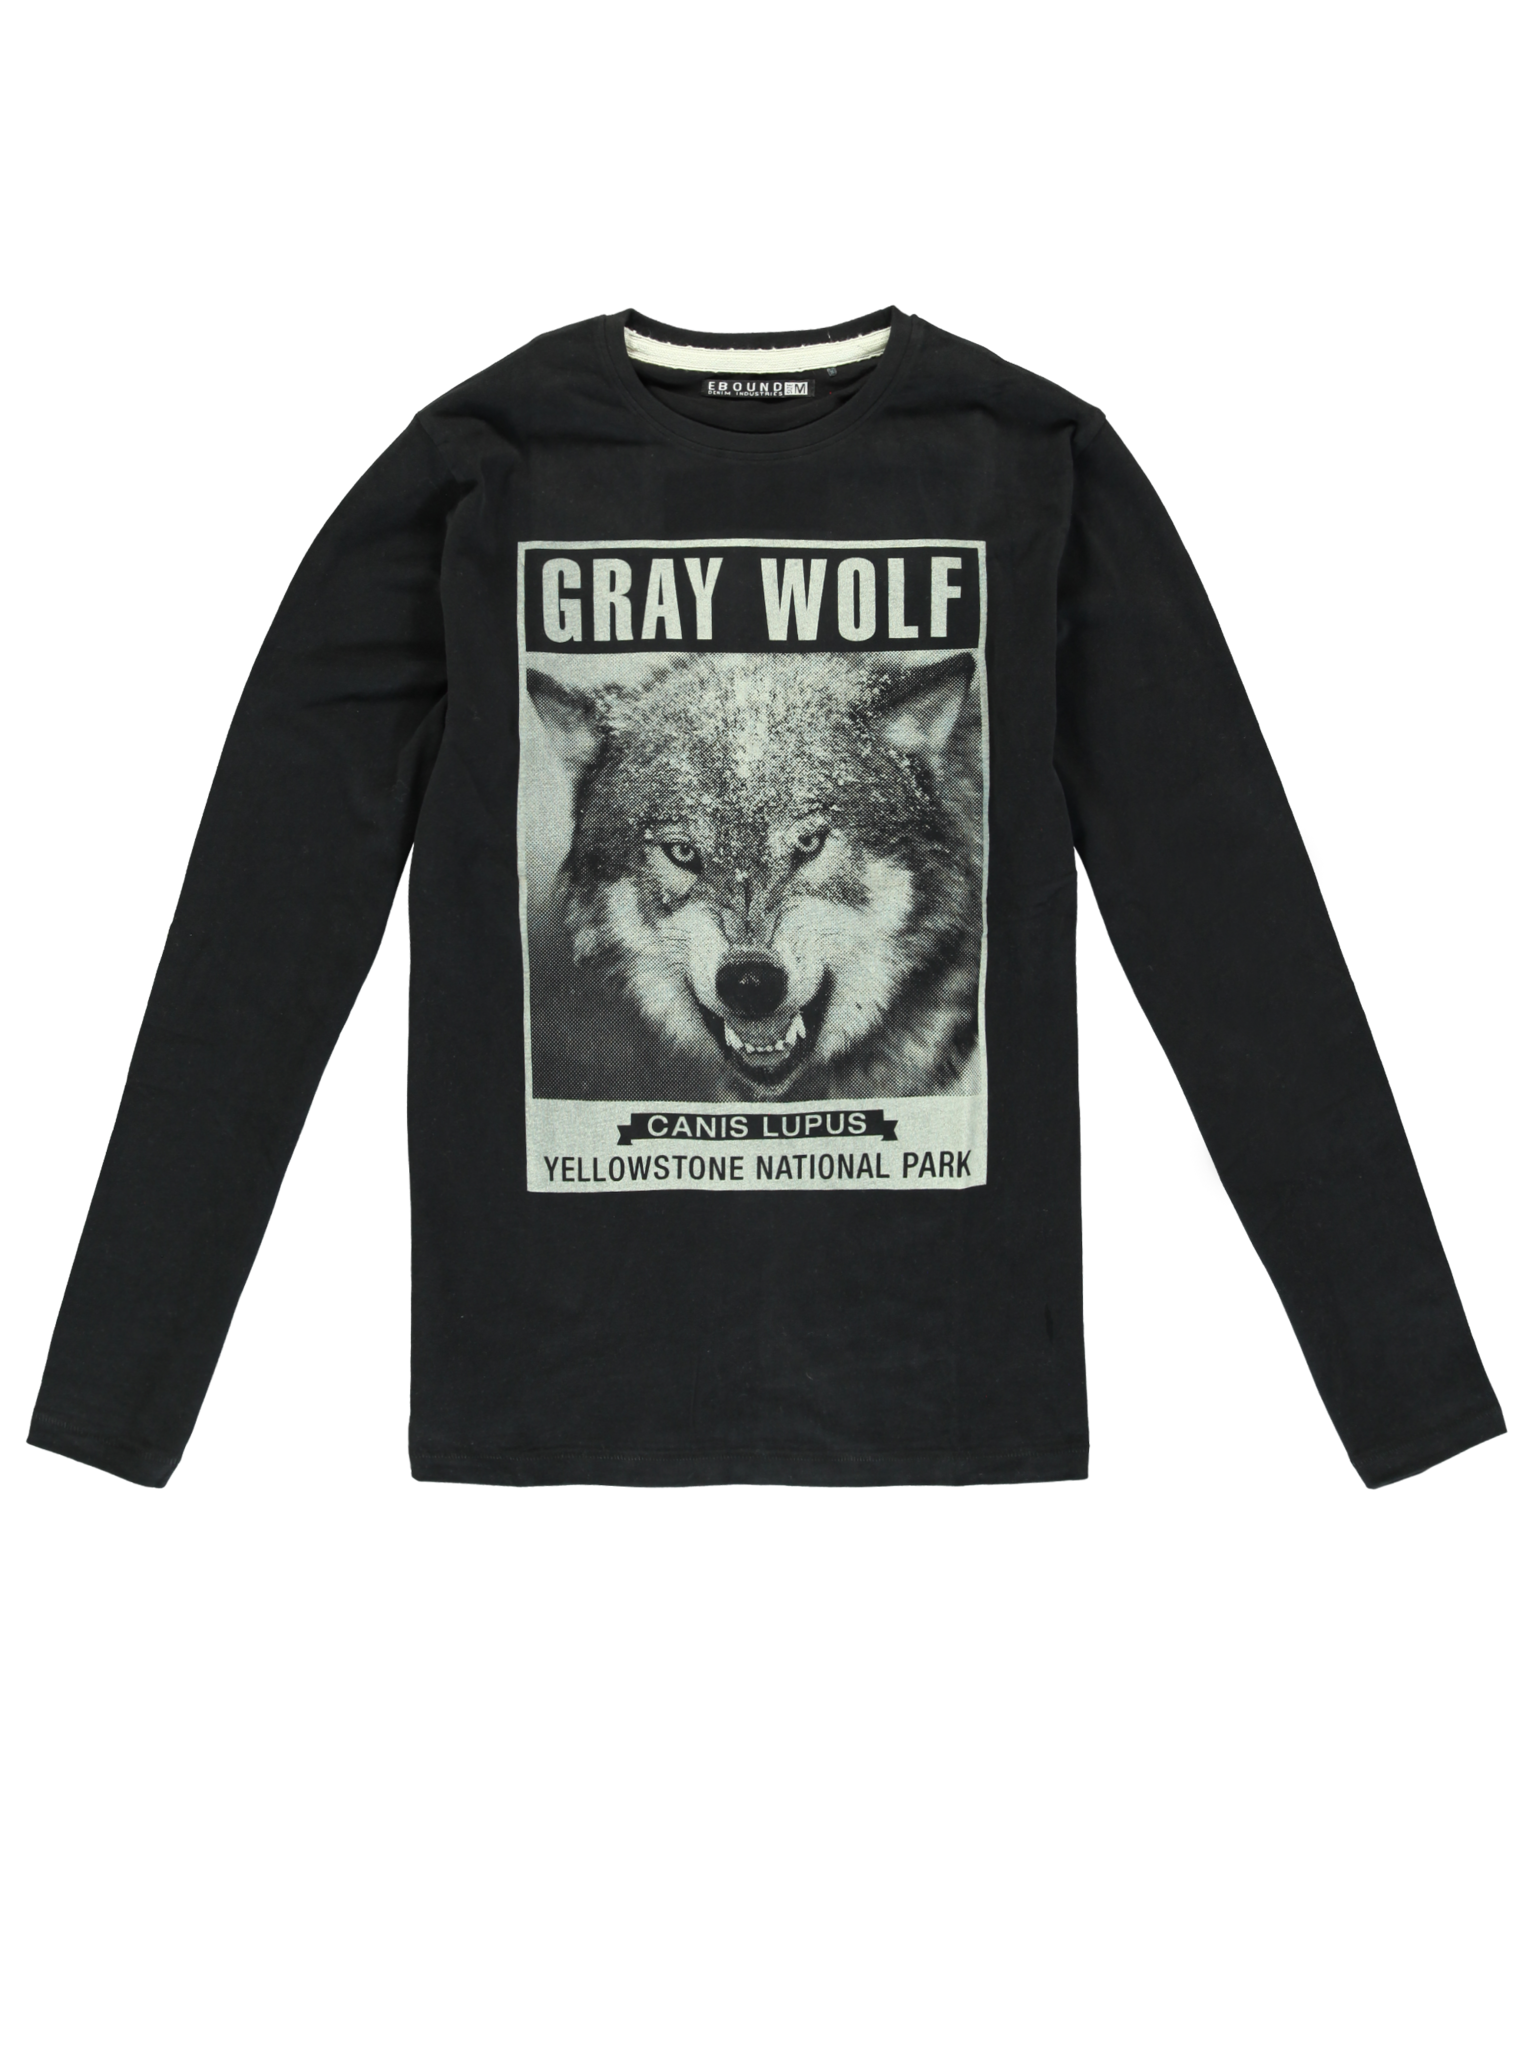 All Brands | Winterproducts Men | T-shirt | 24 pcs/box